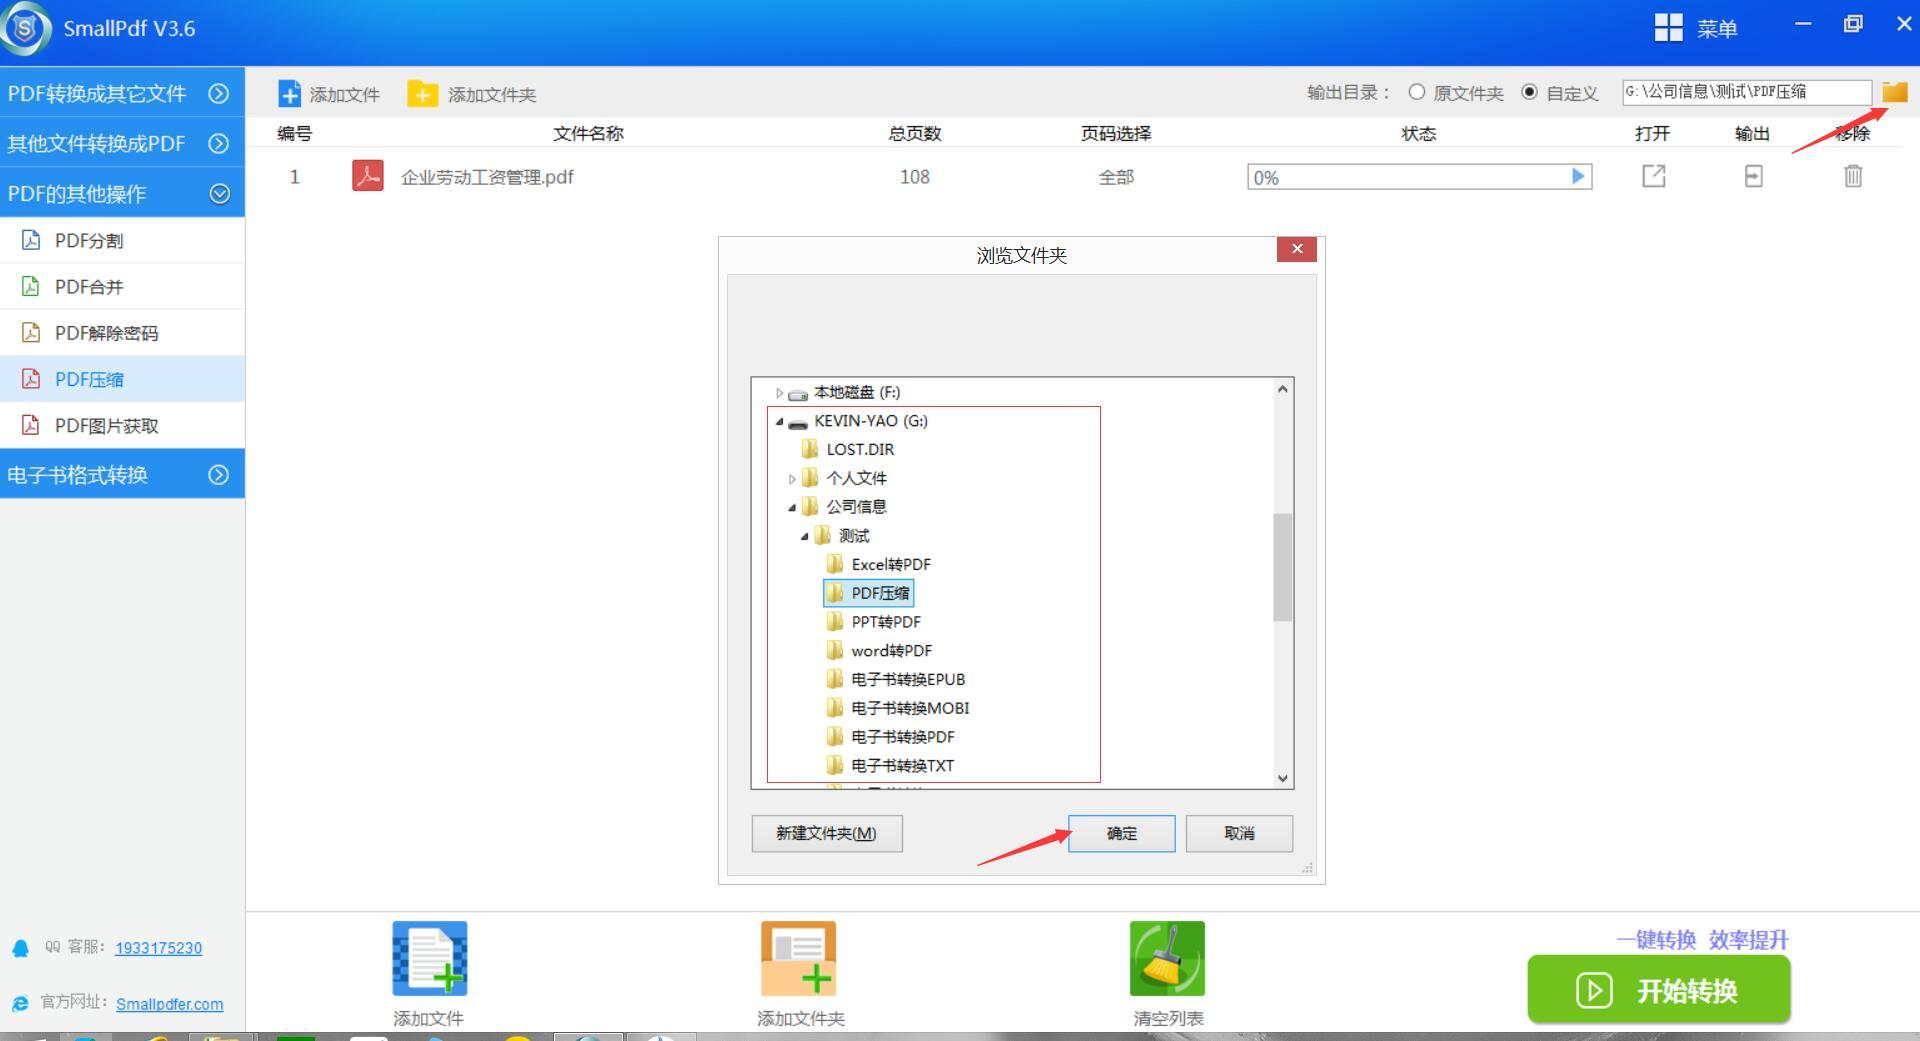 Small PDF转换成JPG软件PDF压缩操作-5